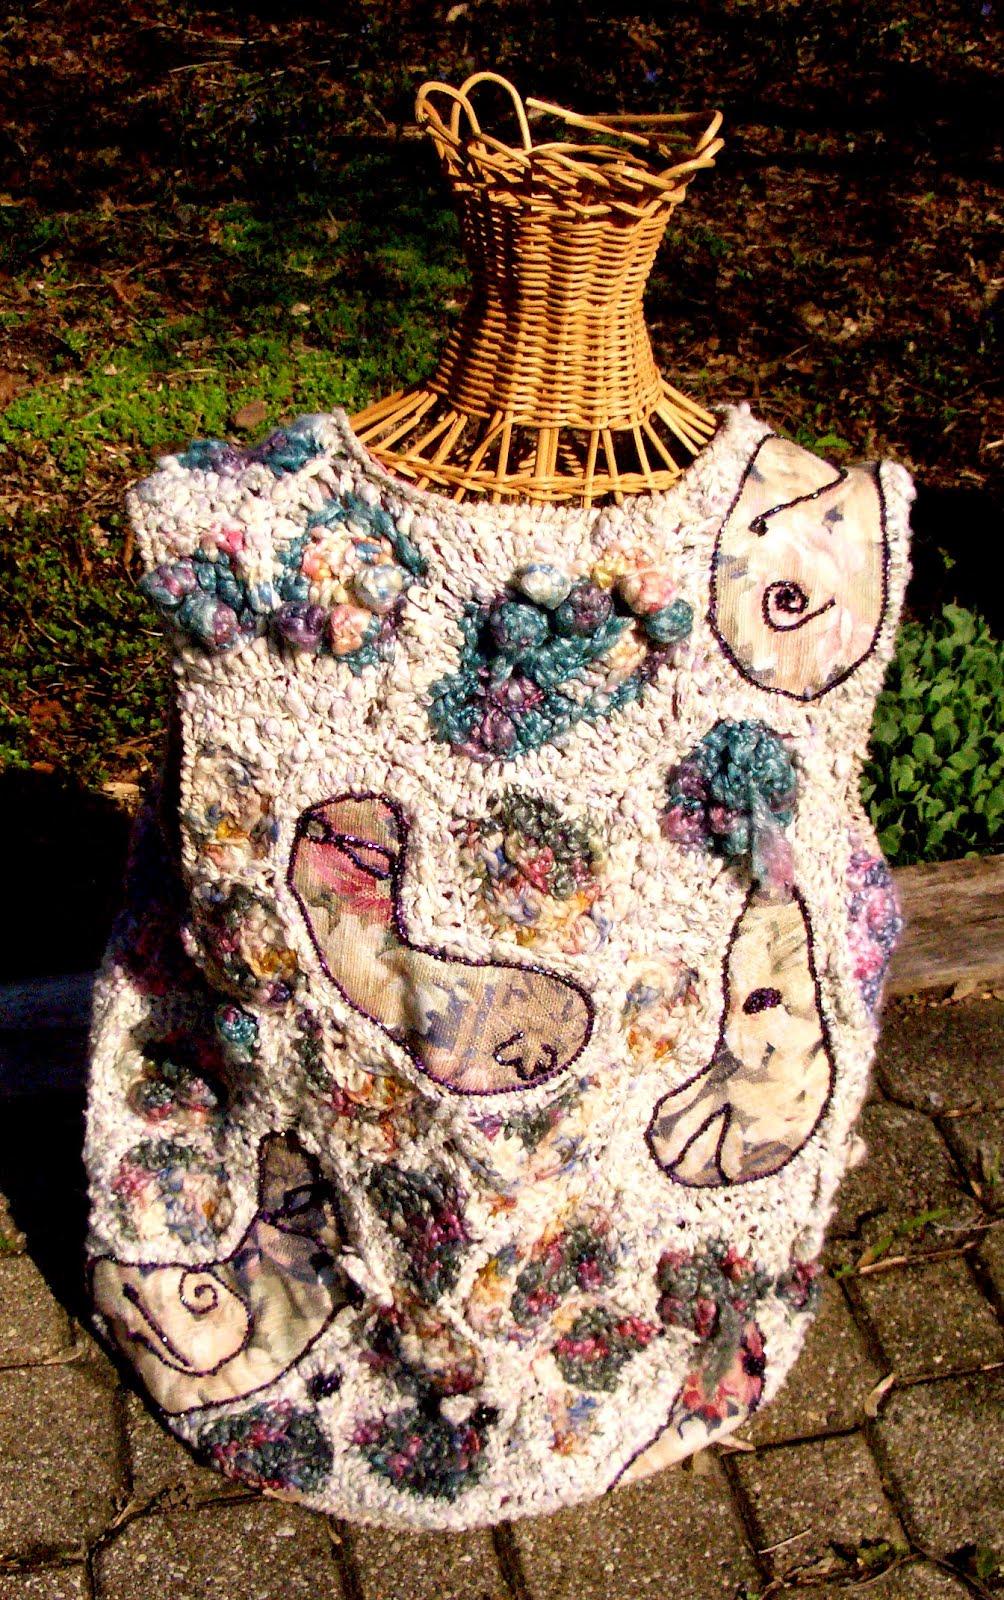 Crochet Queen: Royal Ramblings: International Free Form Crochet Guild